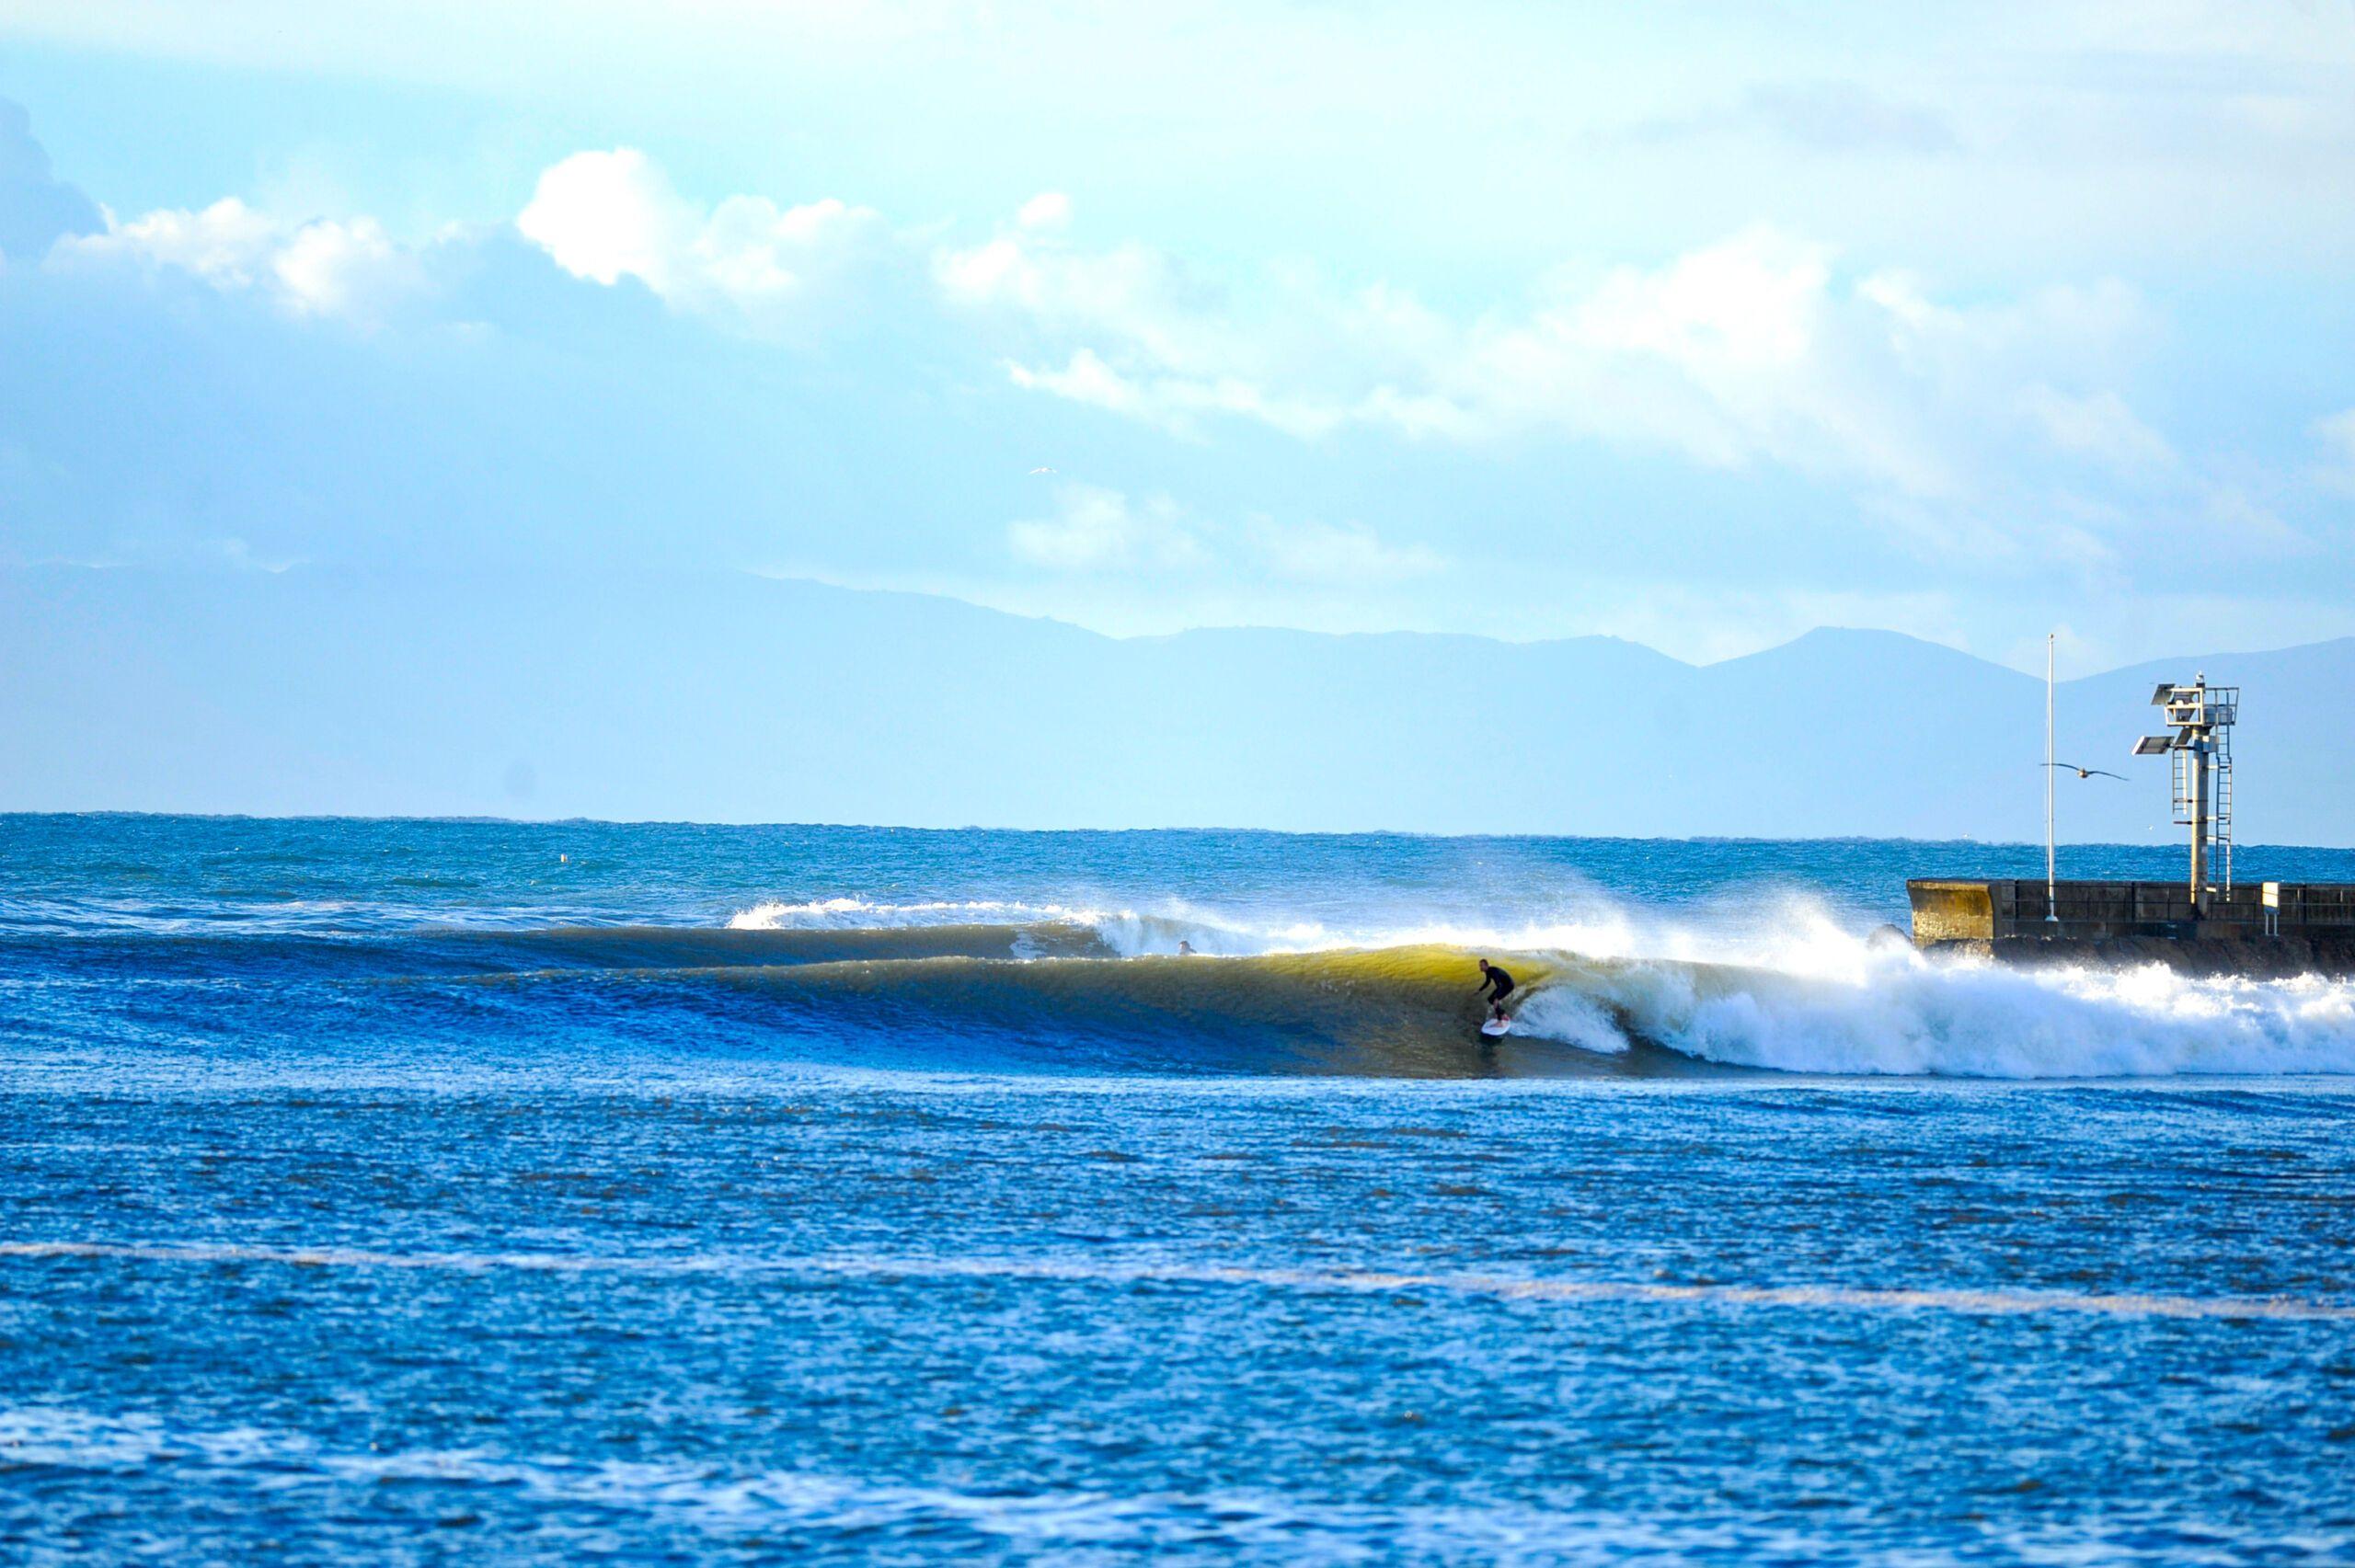 Santa,Barbara,Surfing,Beach, US Olympic surf team